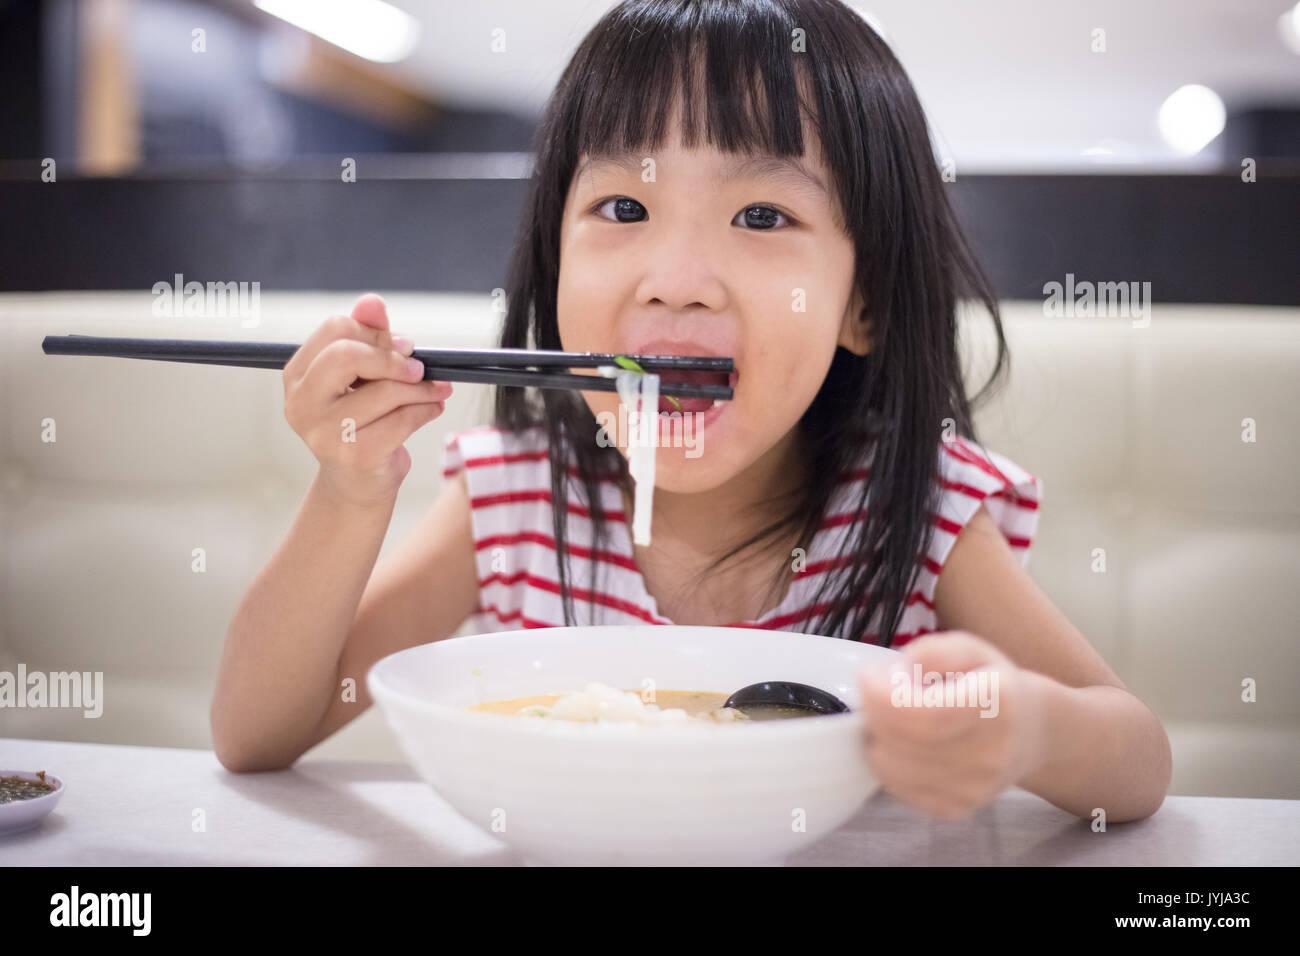 eating noodles Asian